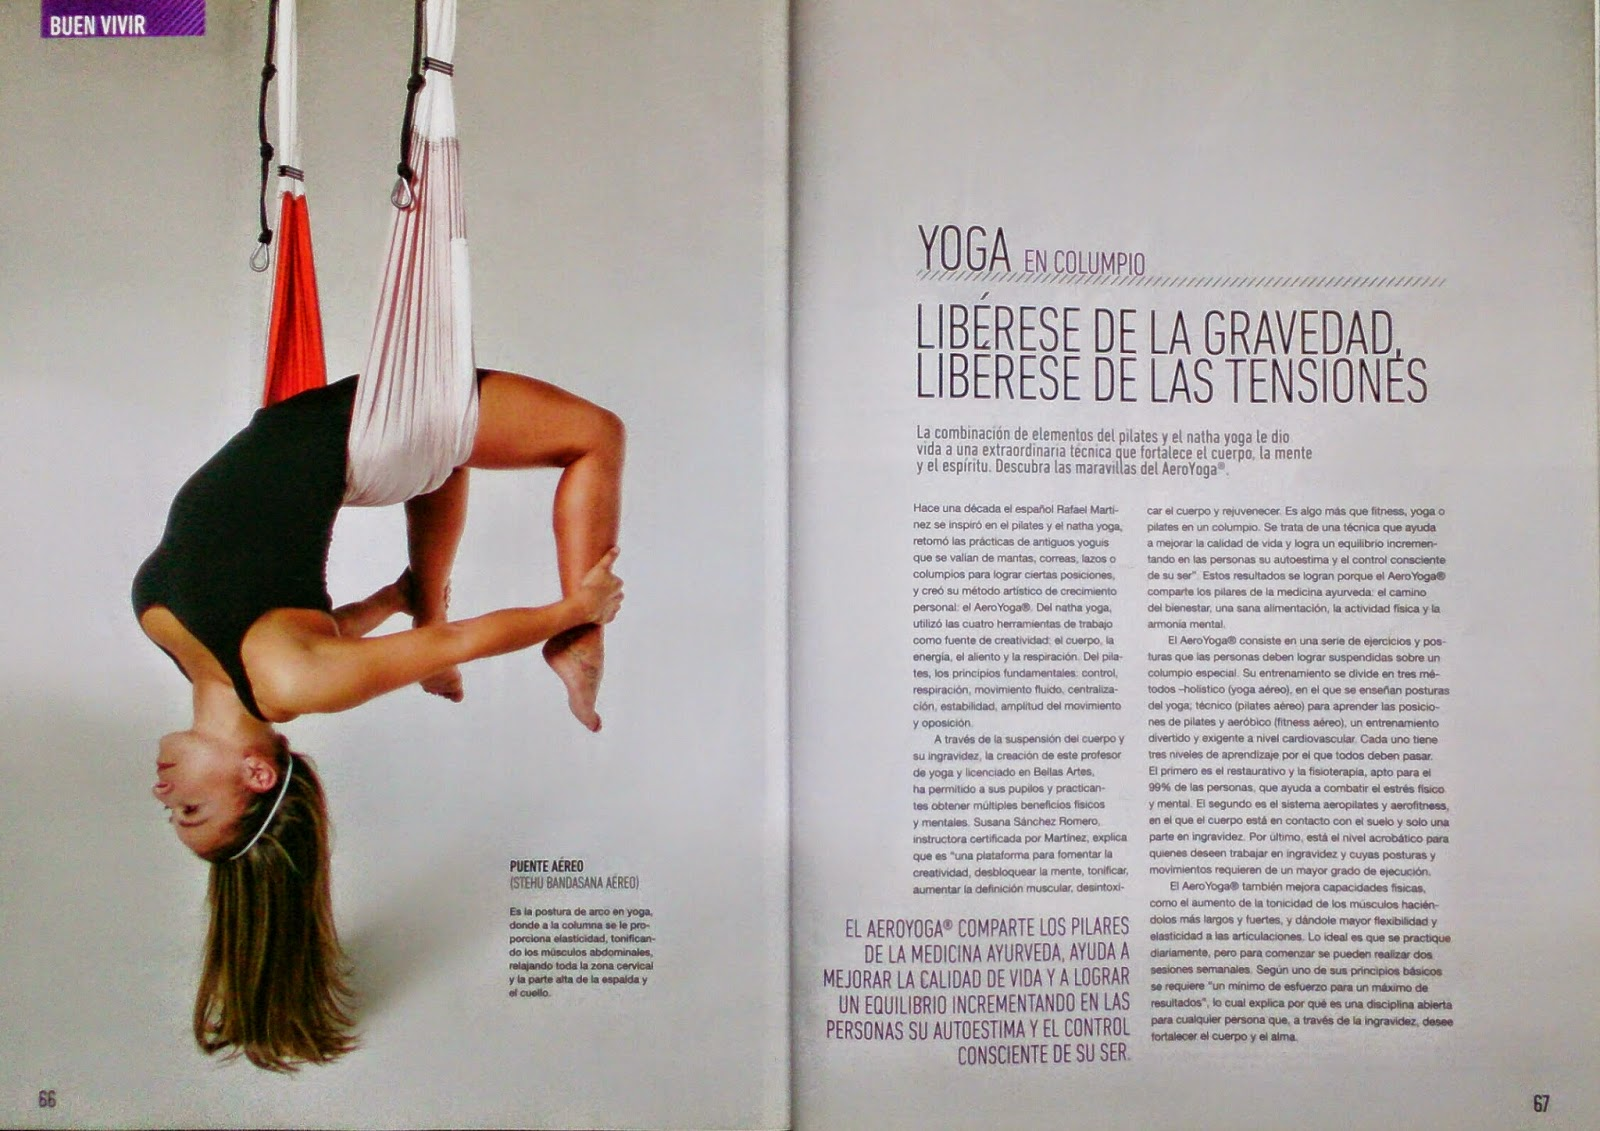 aeroyoga latinoamerica acro pilates yoga aereo acrobatico colombia